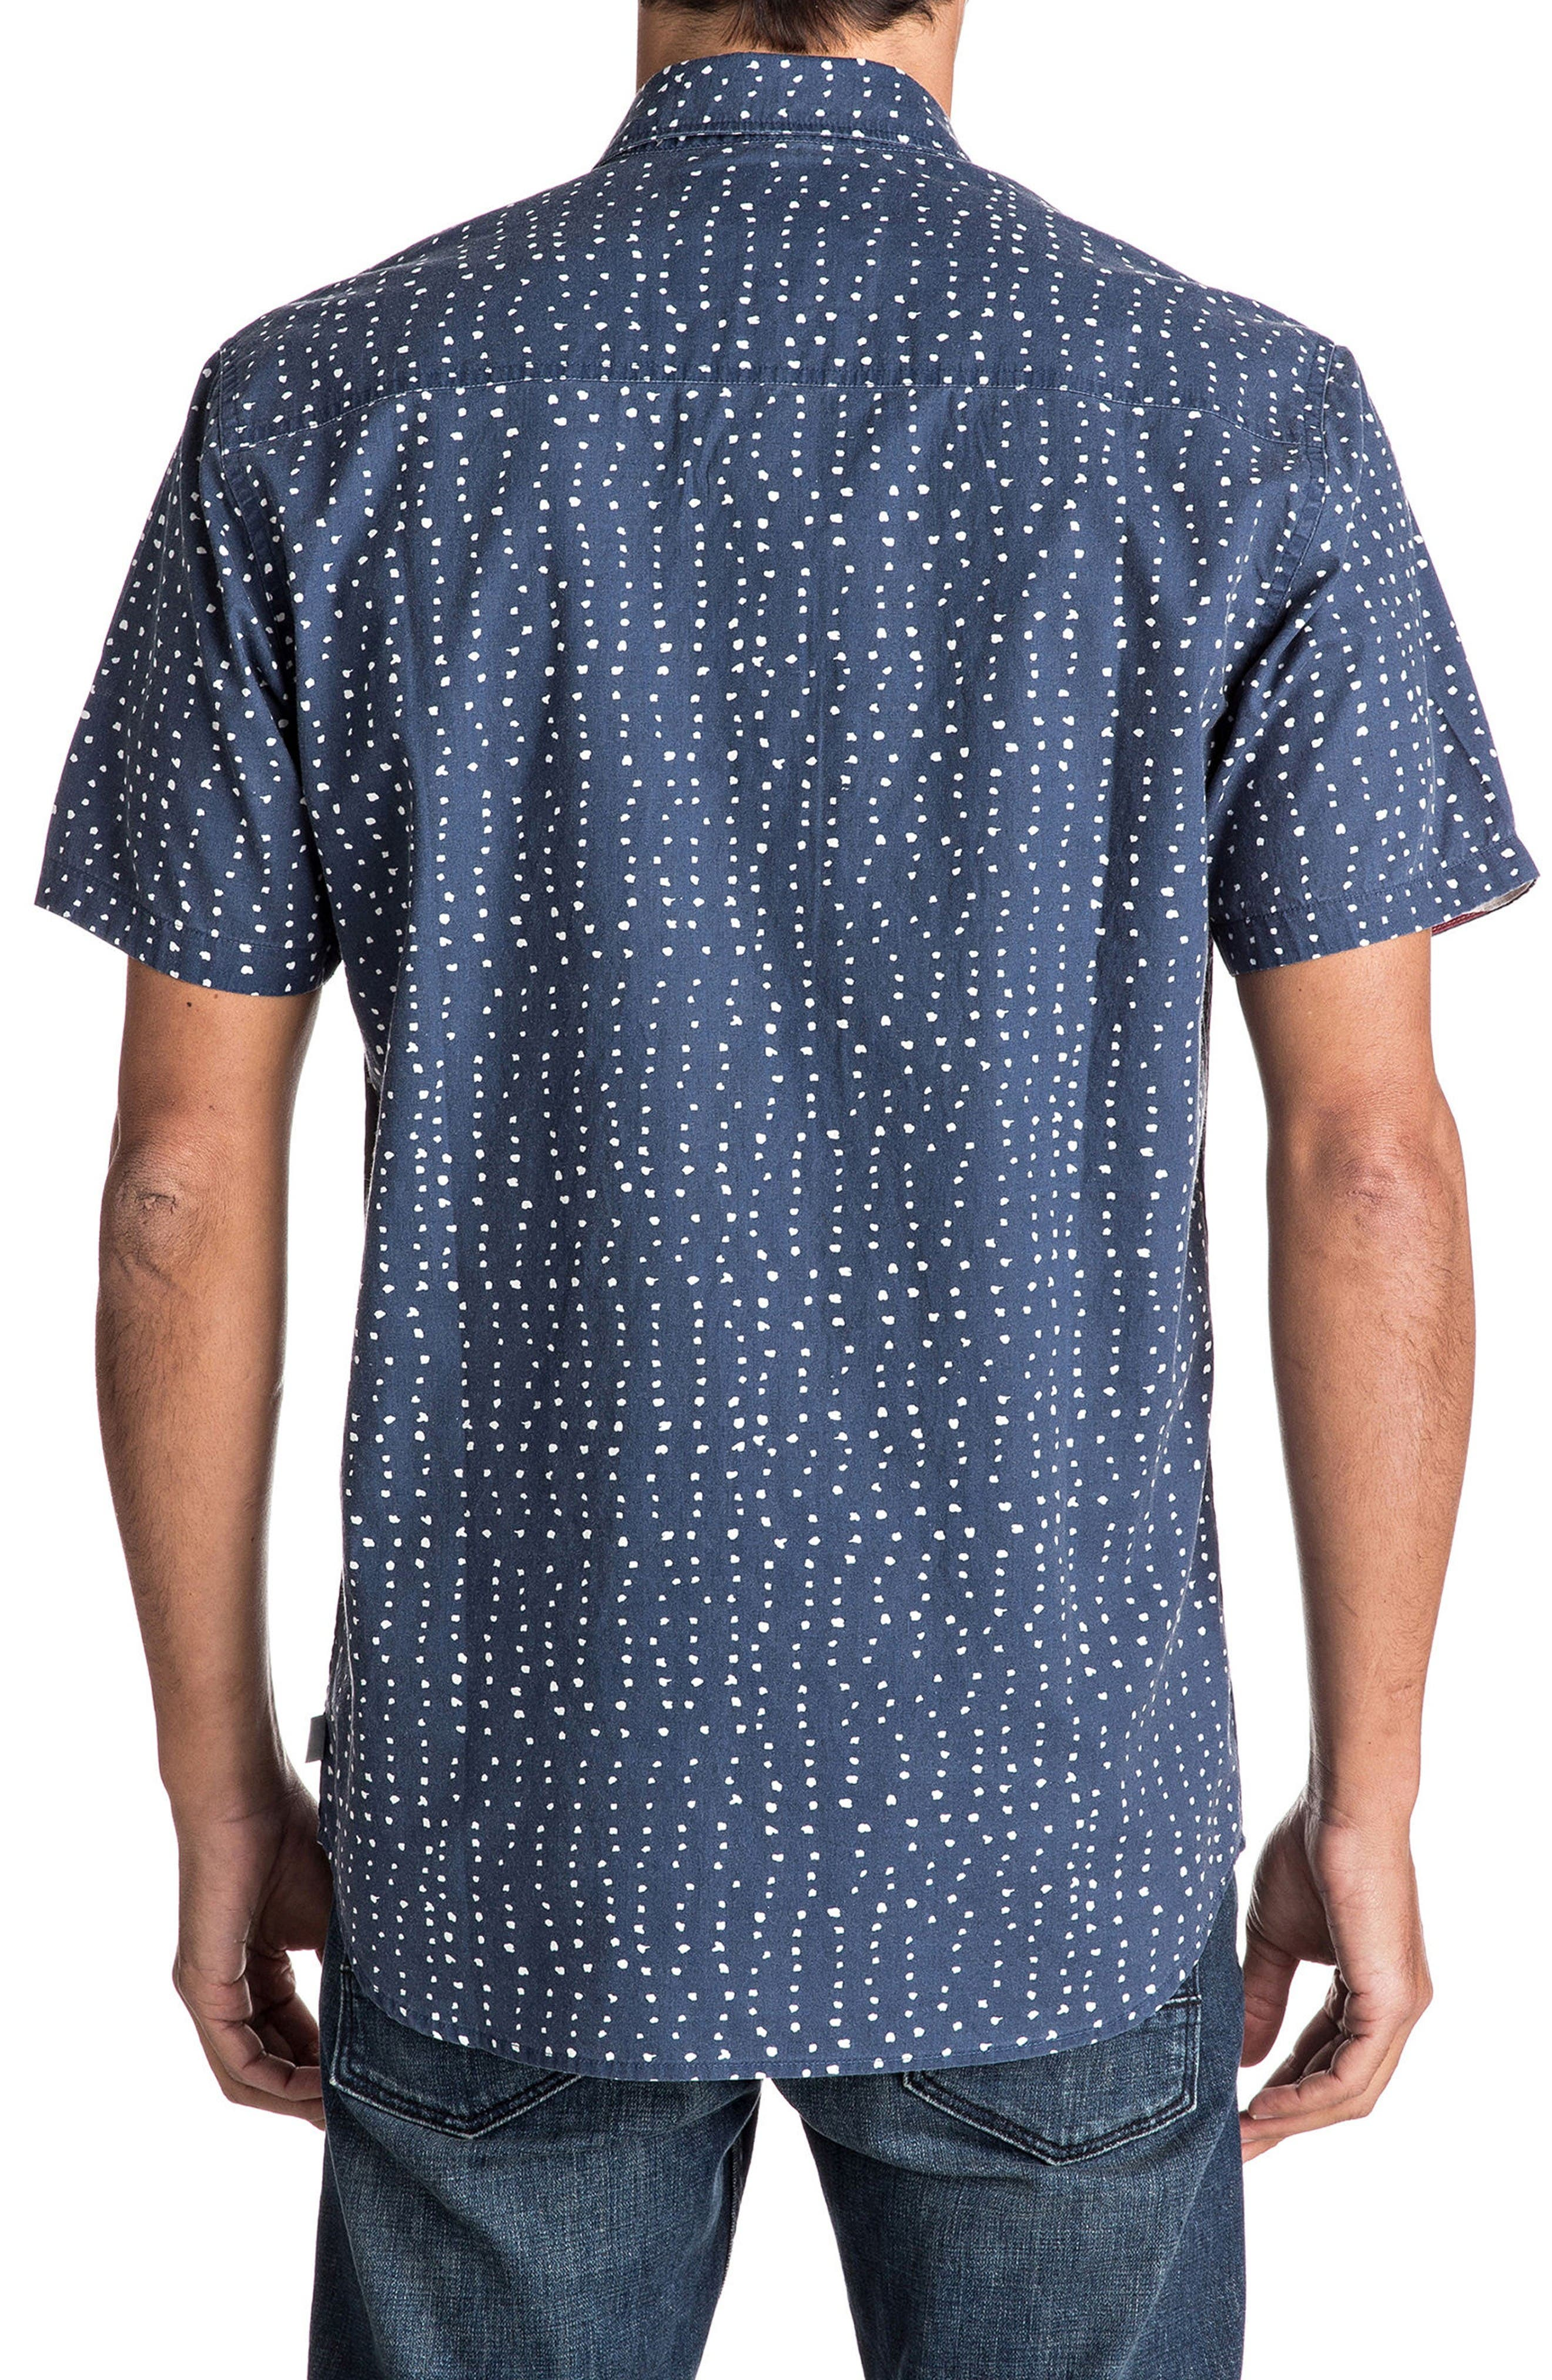 New Merica Print Shirt,                             Alternate thumbnail 2, color,                             Dark Denim Spaced